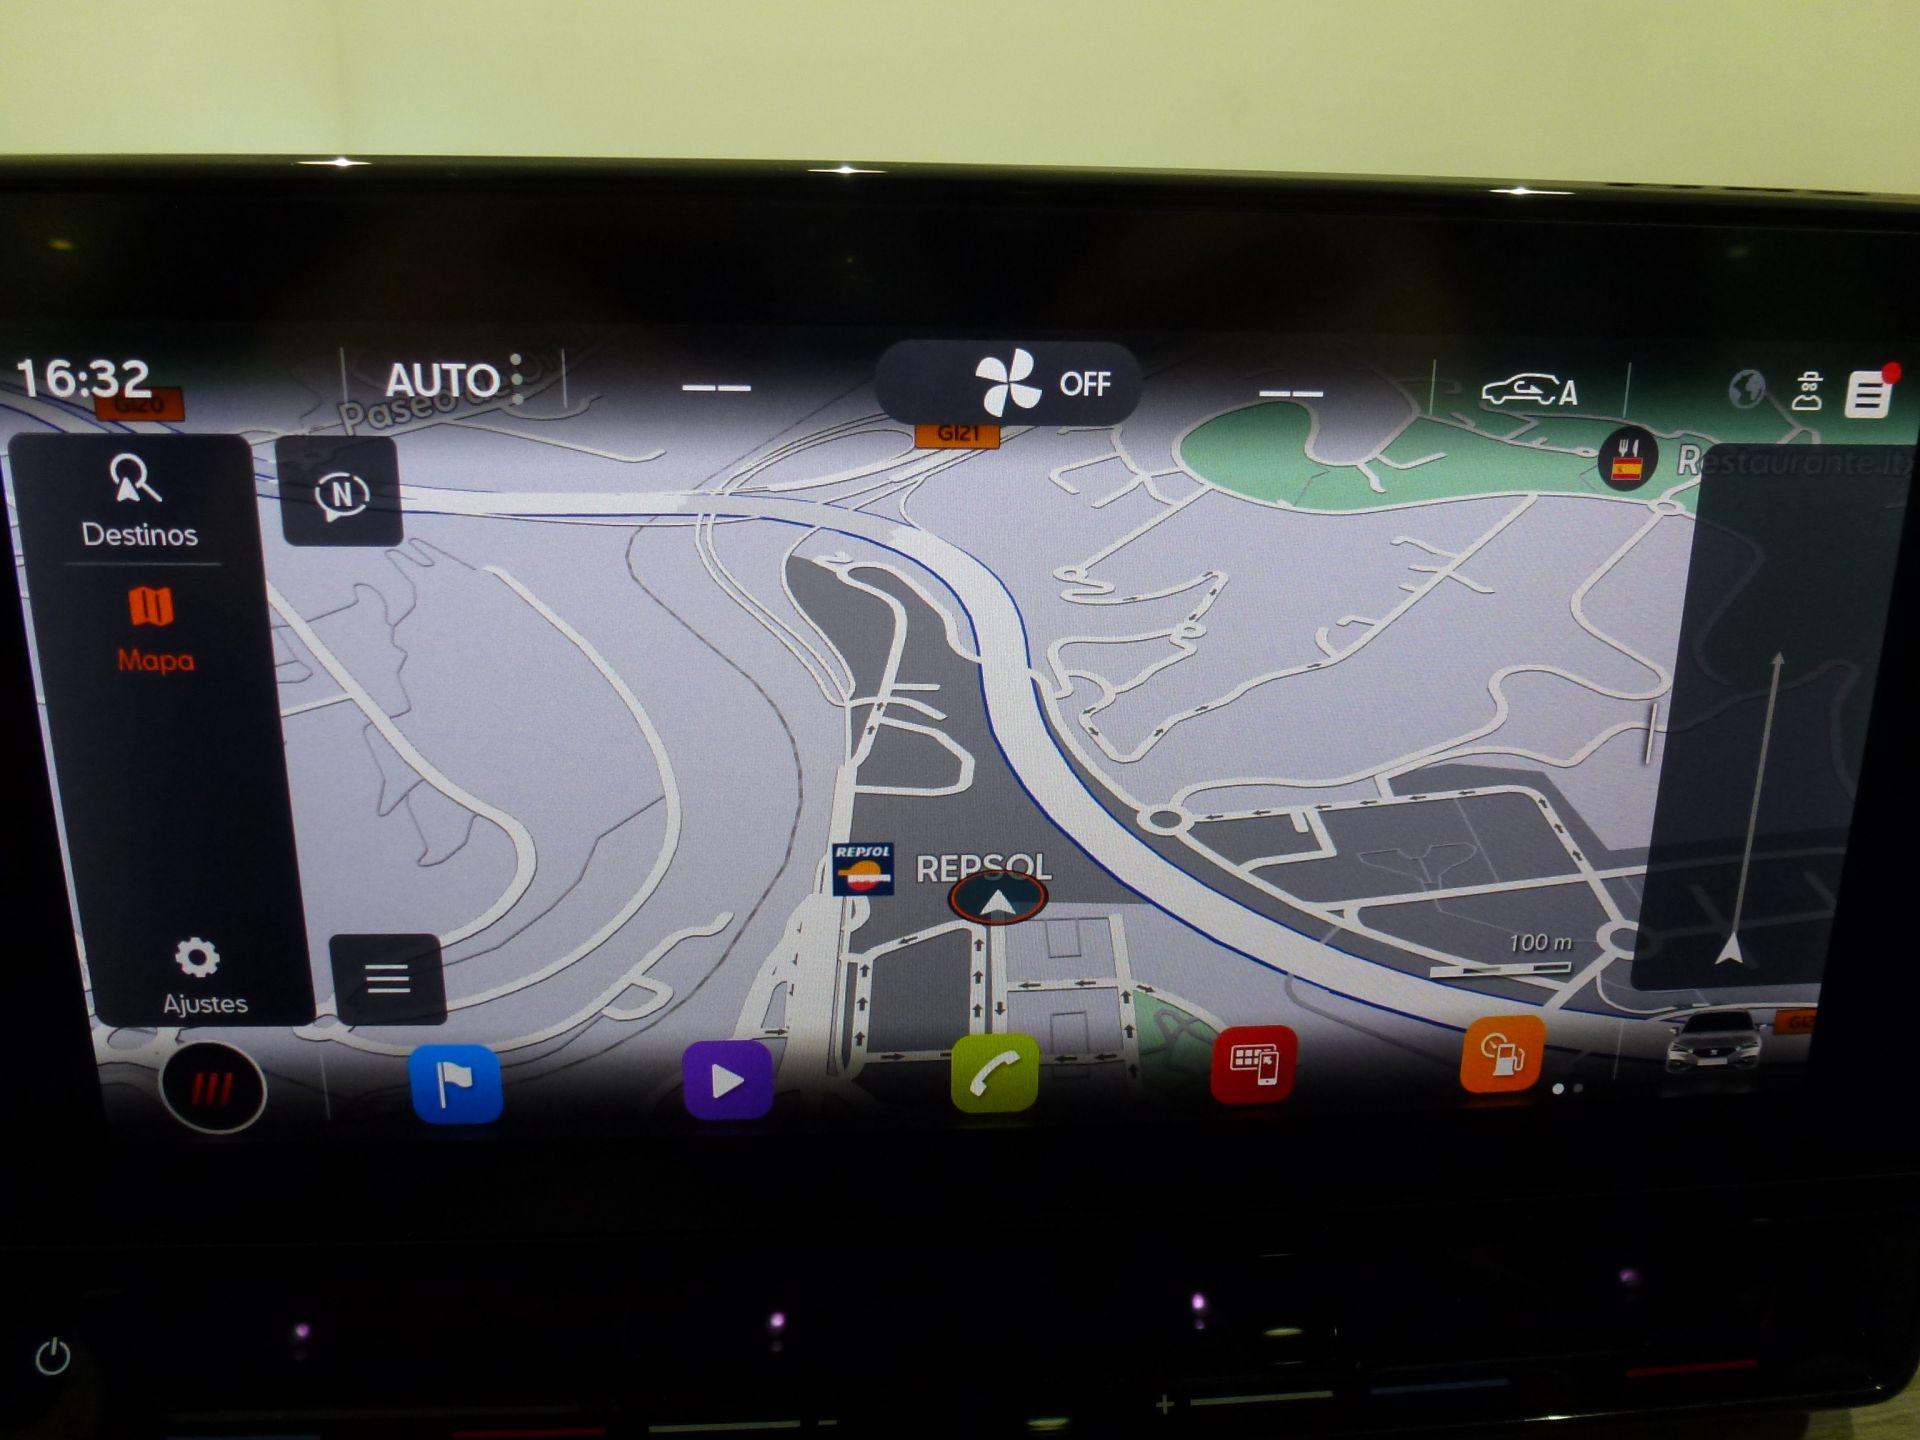 SEAT Nuevo León SP 1.4 e-Hybrid DSG S&S Xcellence